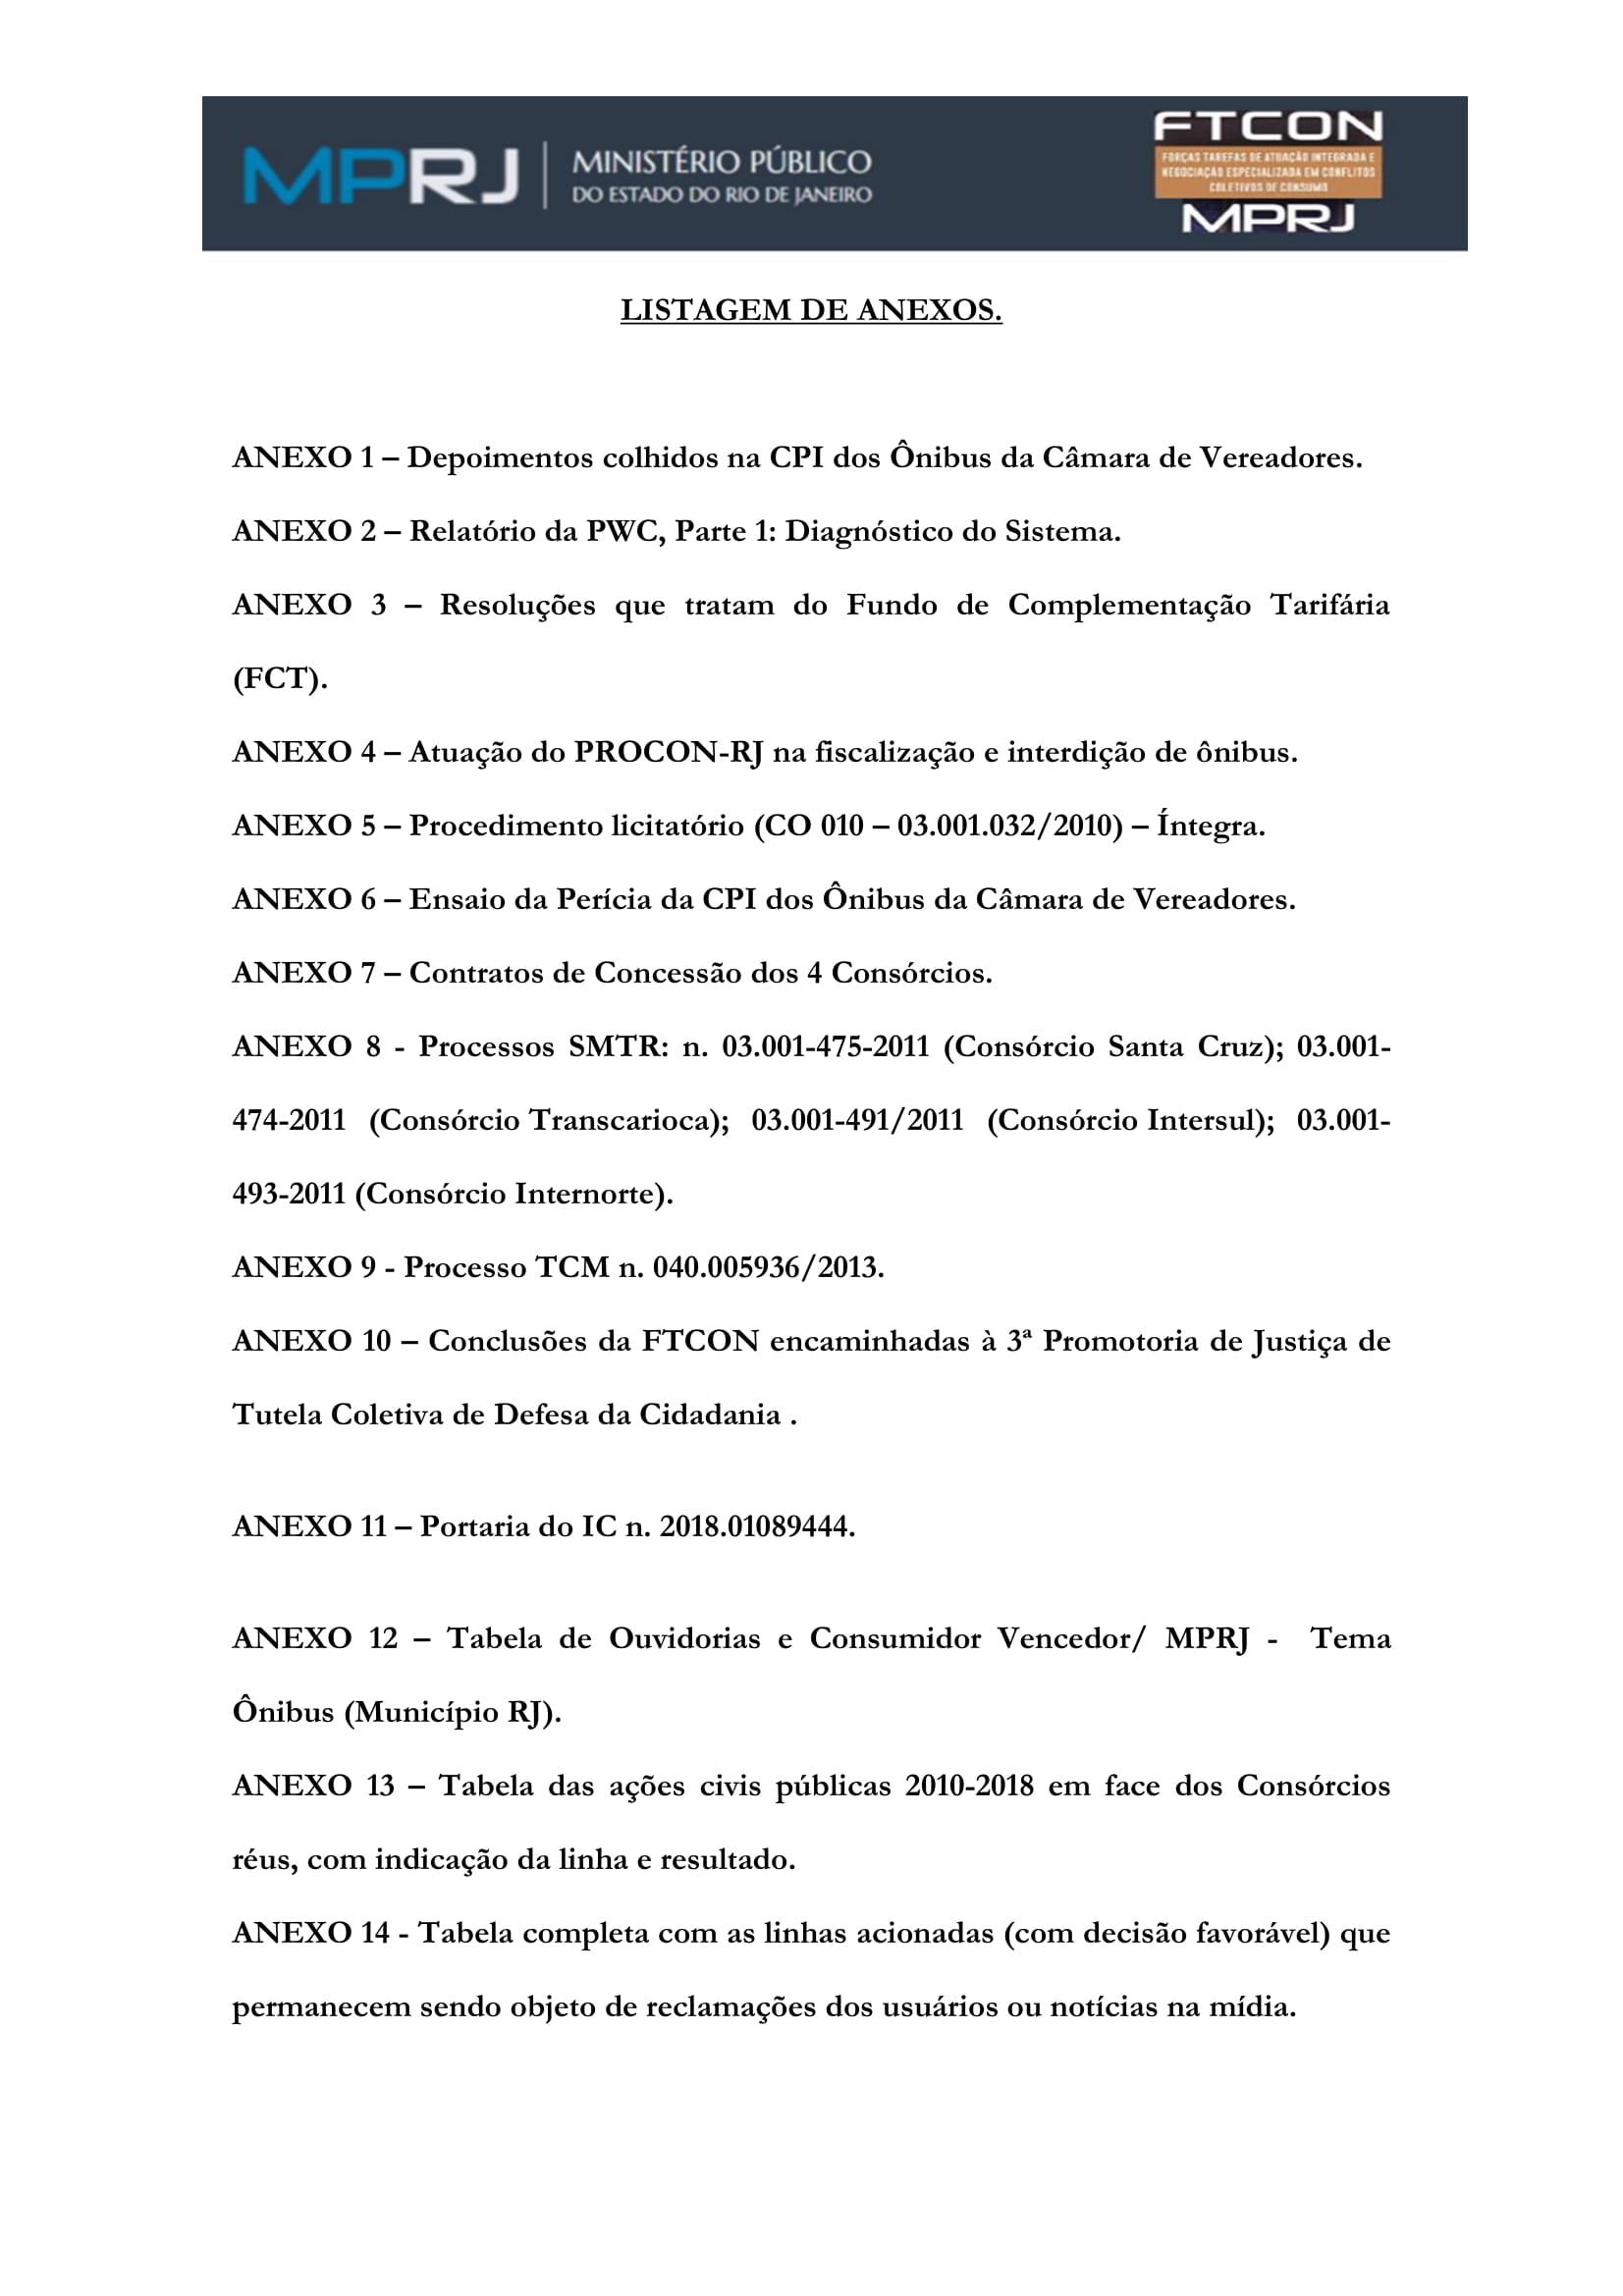 acp_caducidade_onibus_dr_rt-139